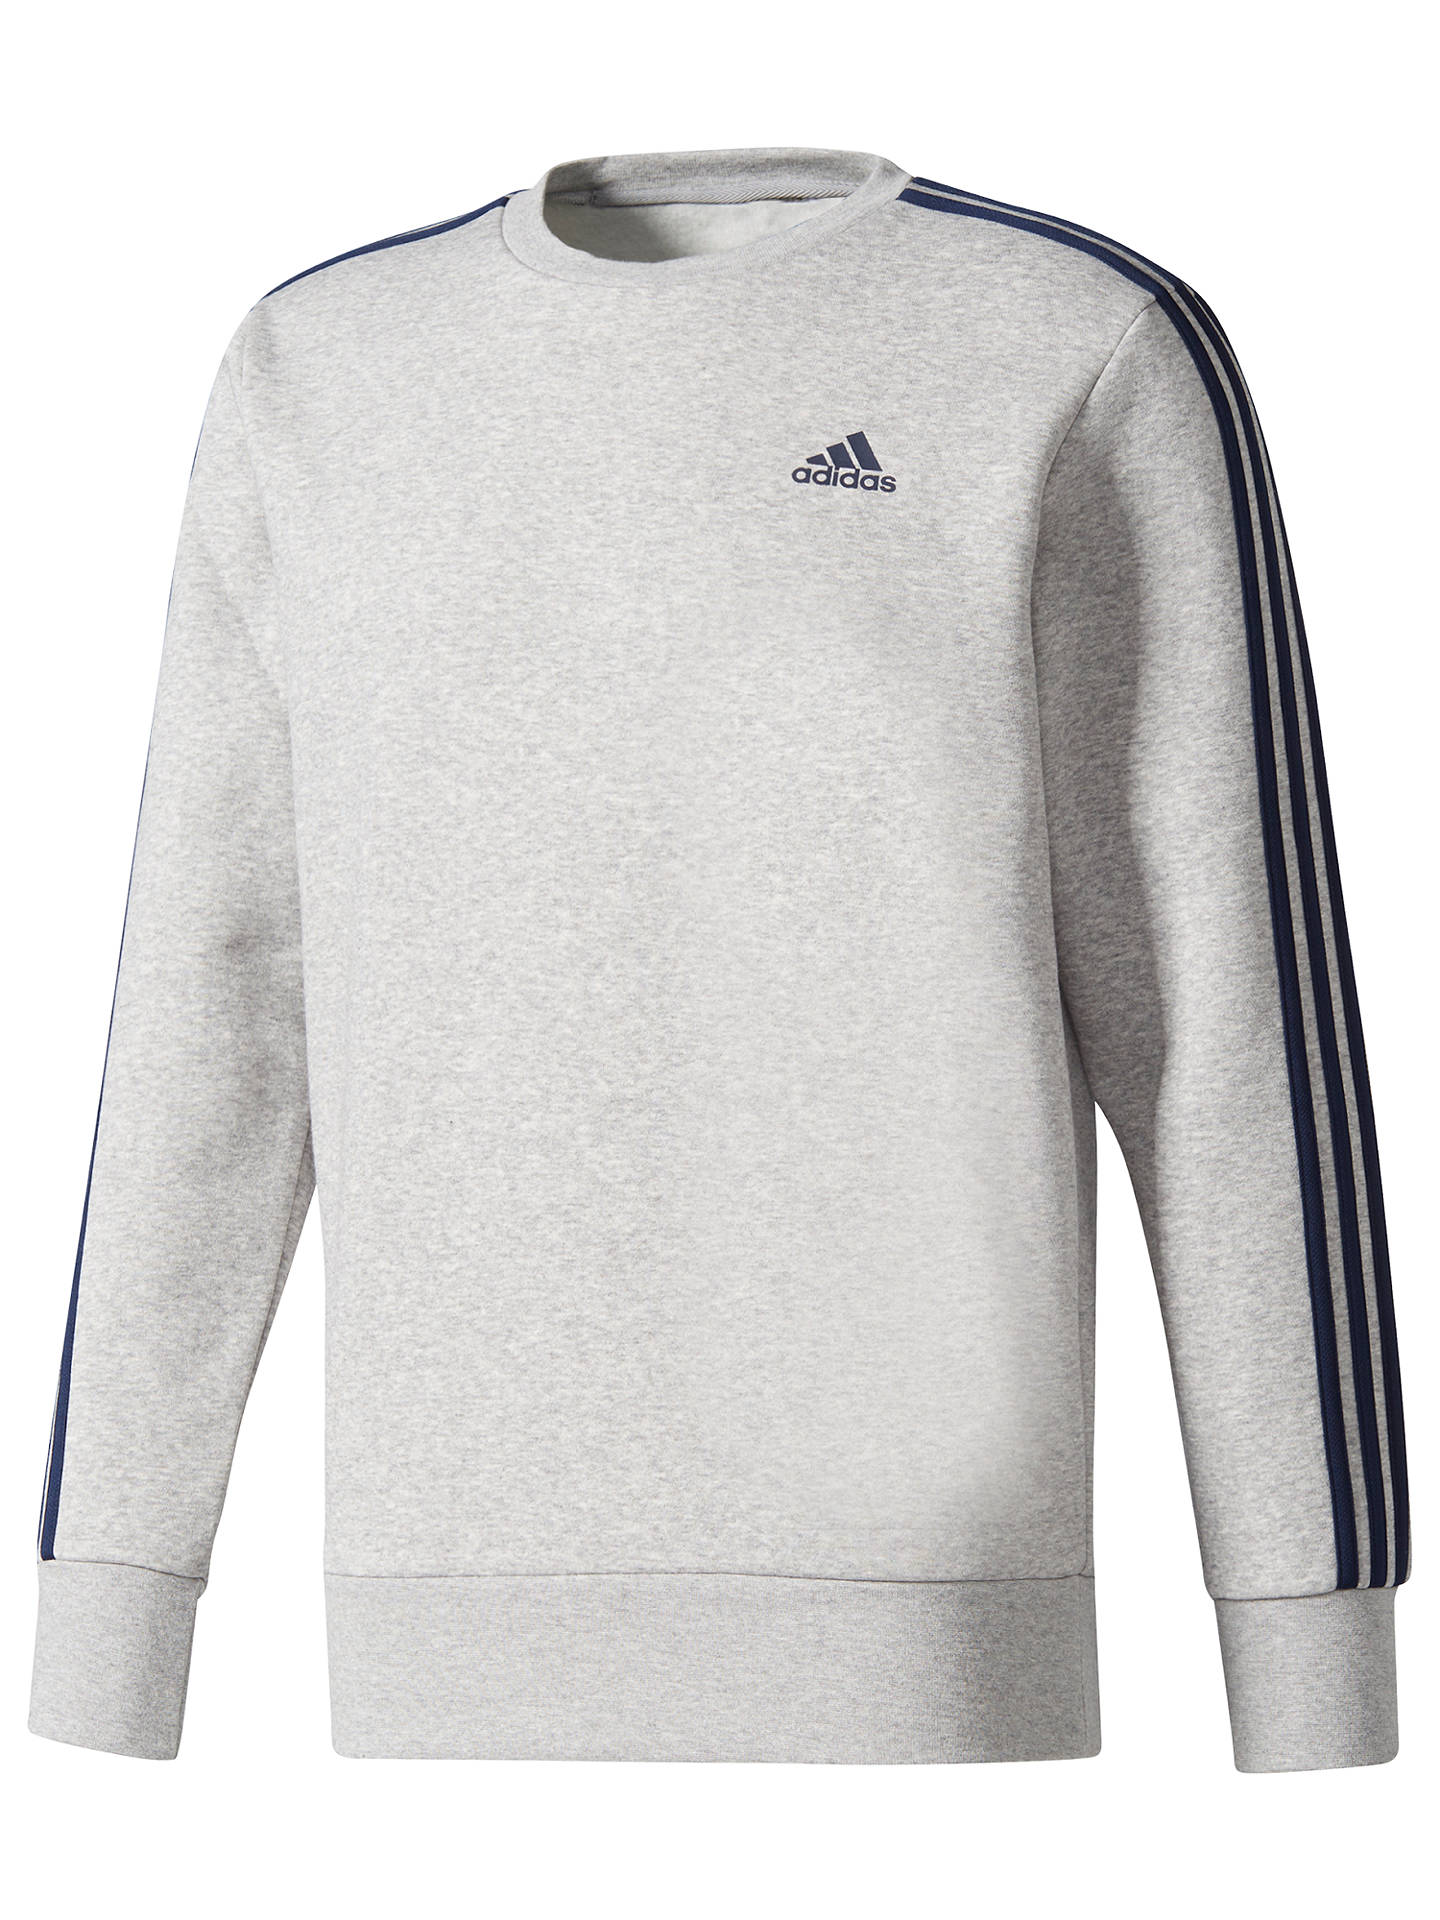 230a144c8 Buy Adidas Essentials 3-Stripes Crew Sweatshirt, Grey, S Online at  johnlewis.